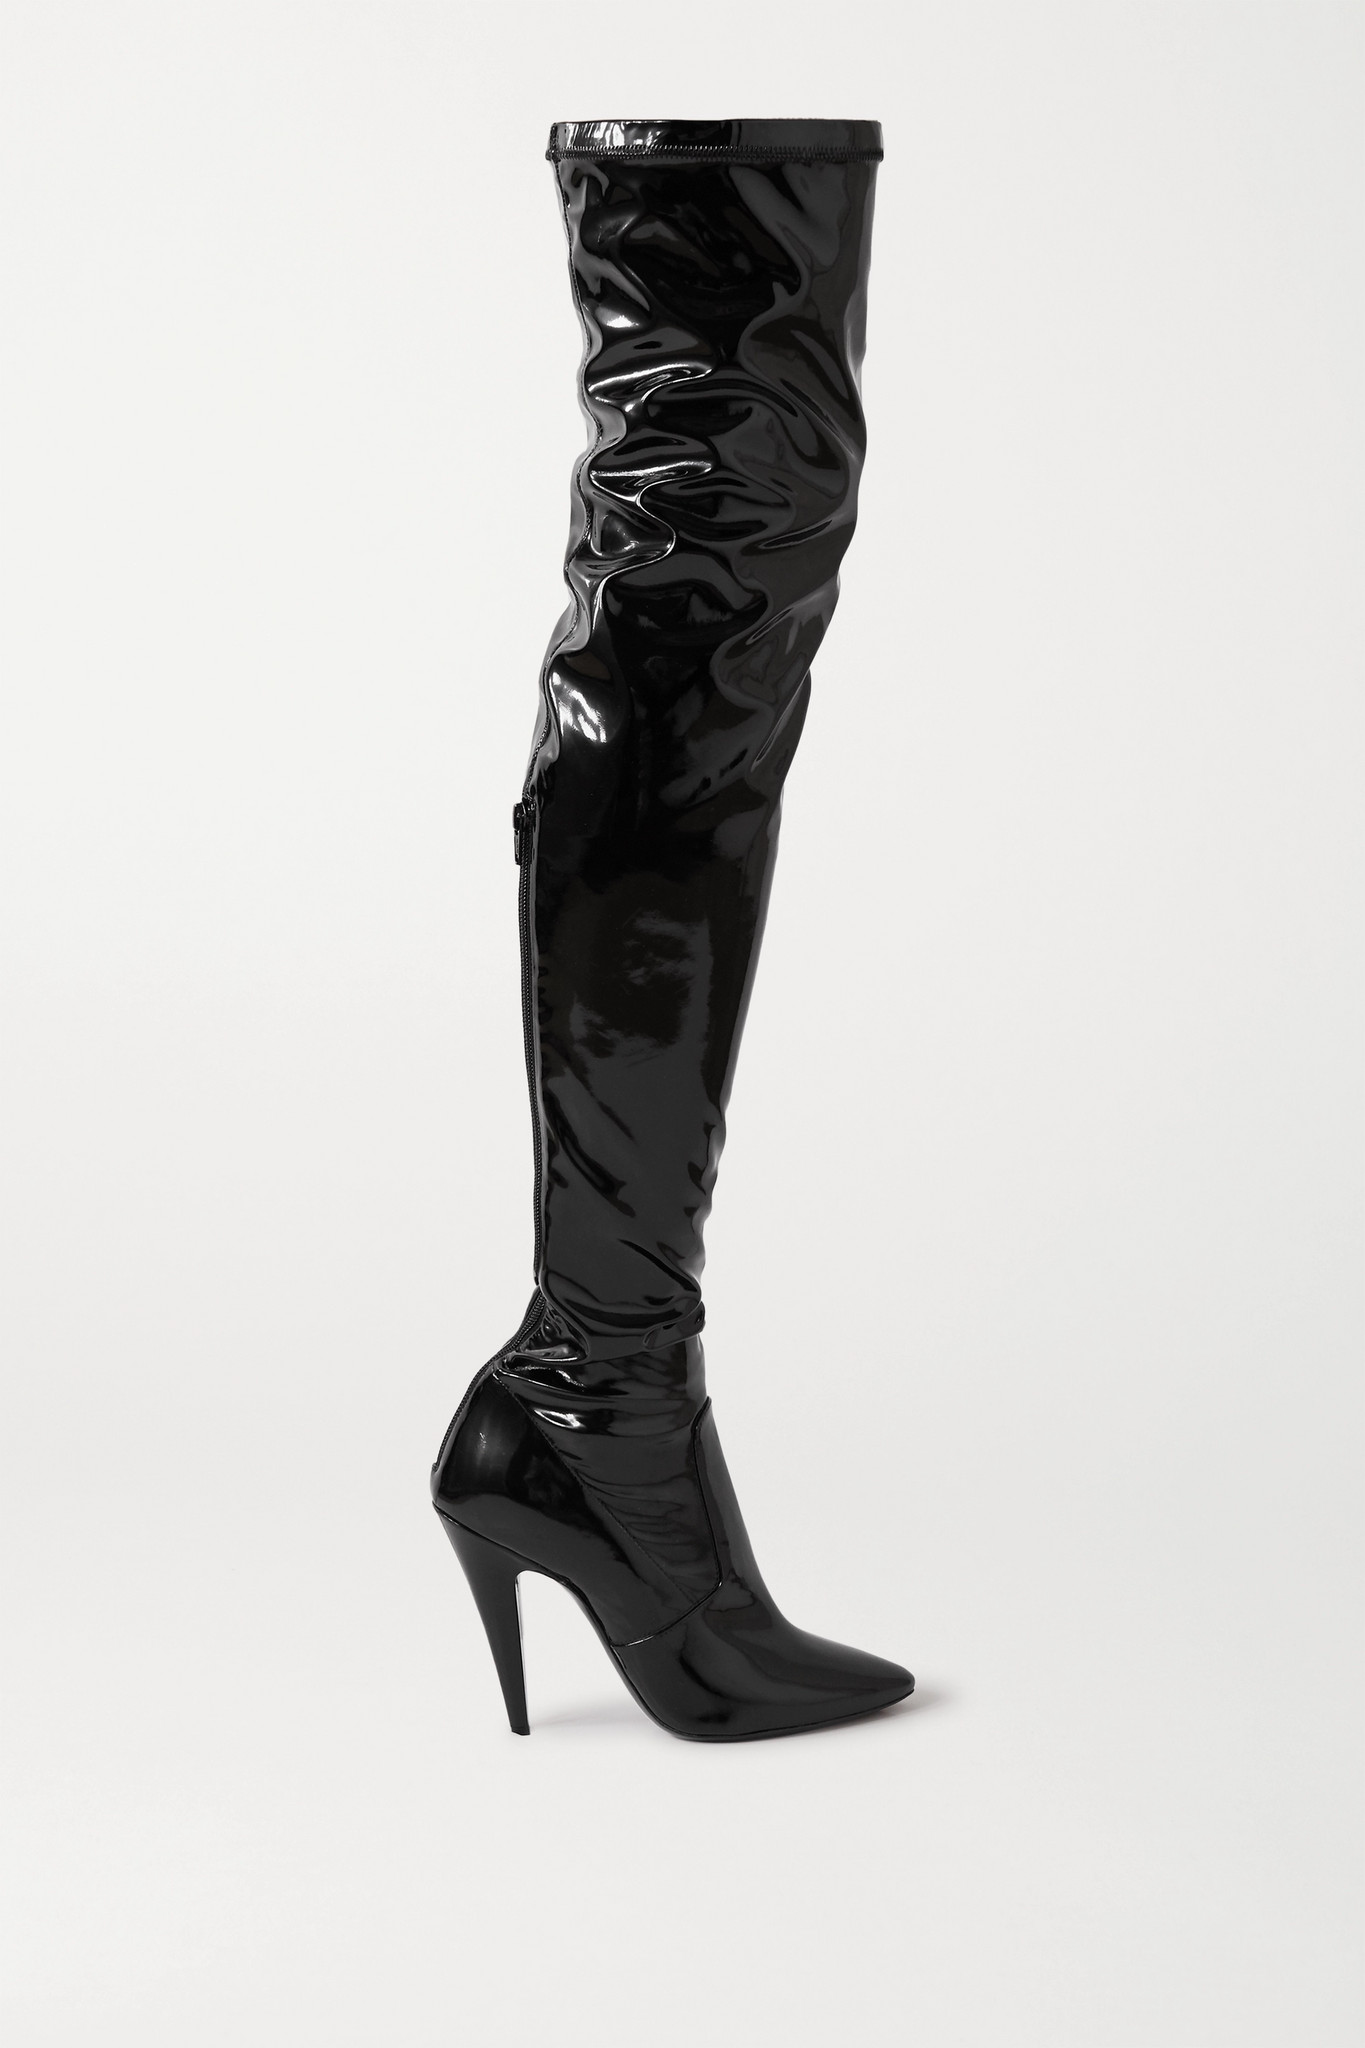 SAINT LAURENT - 漆皮过膝长靴 - 黑色 - IT35